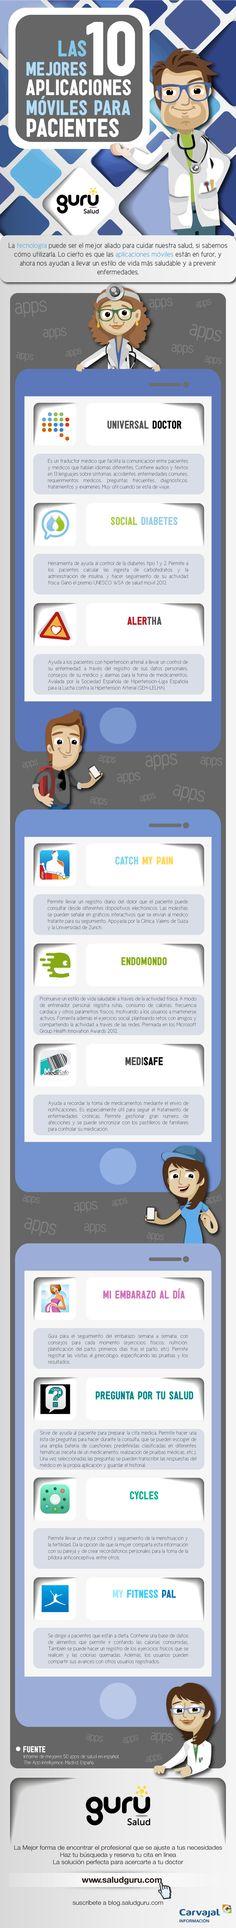 #Infografia Las 10 mejores apps para pacientes